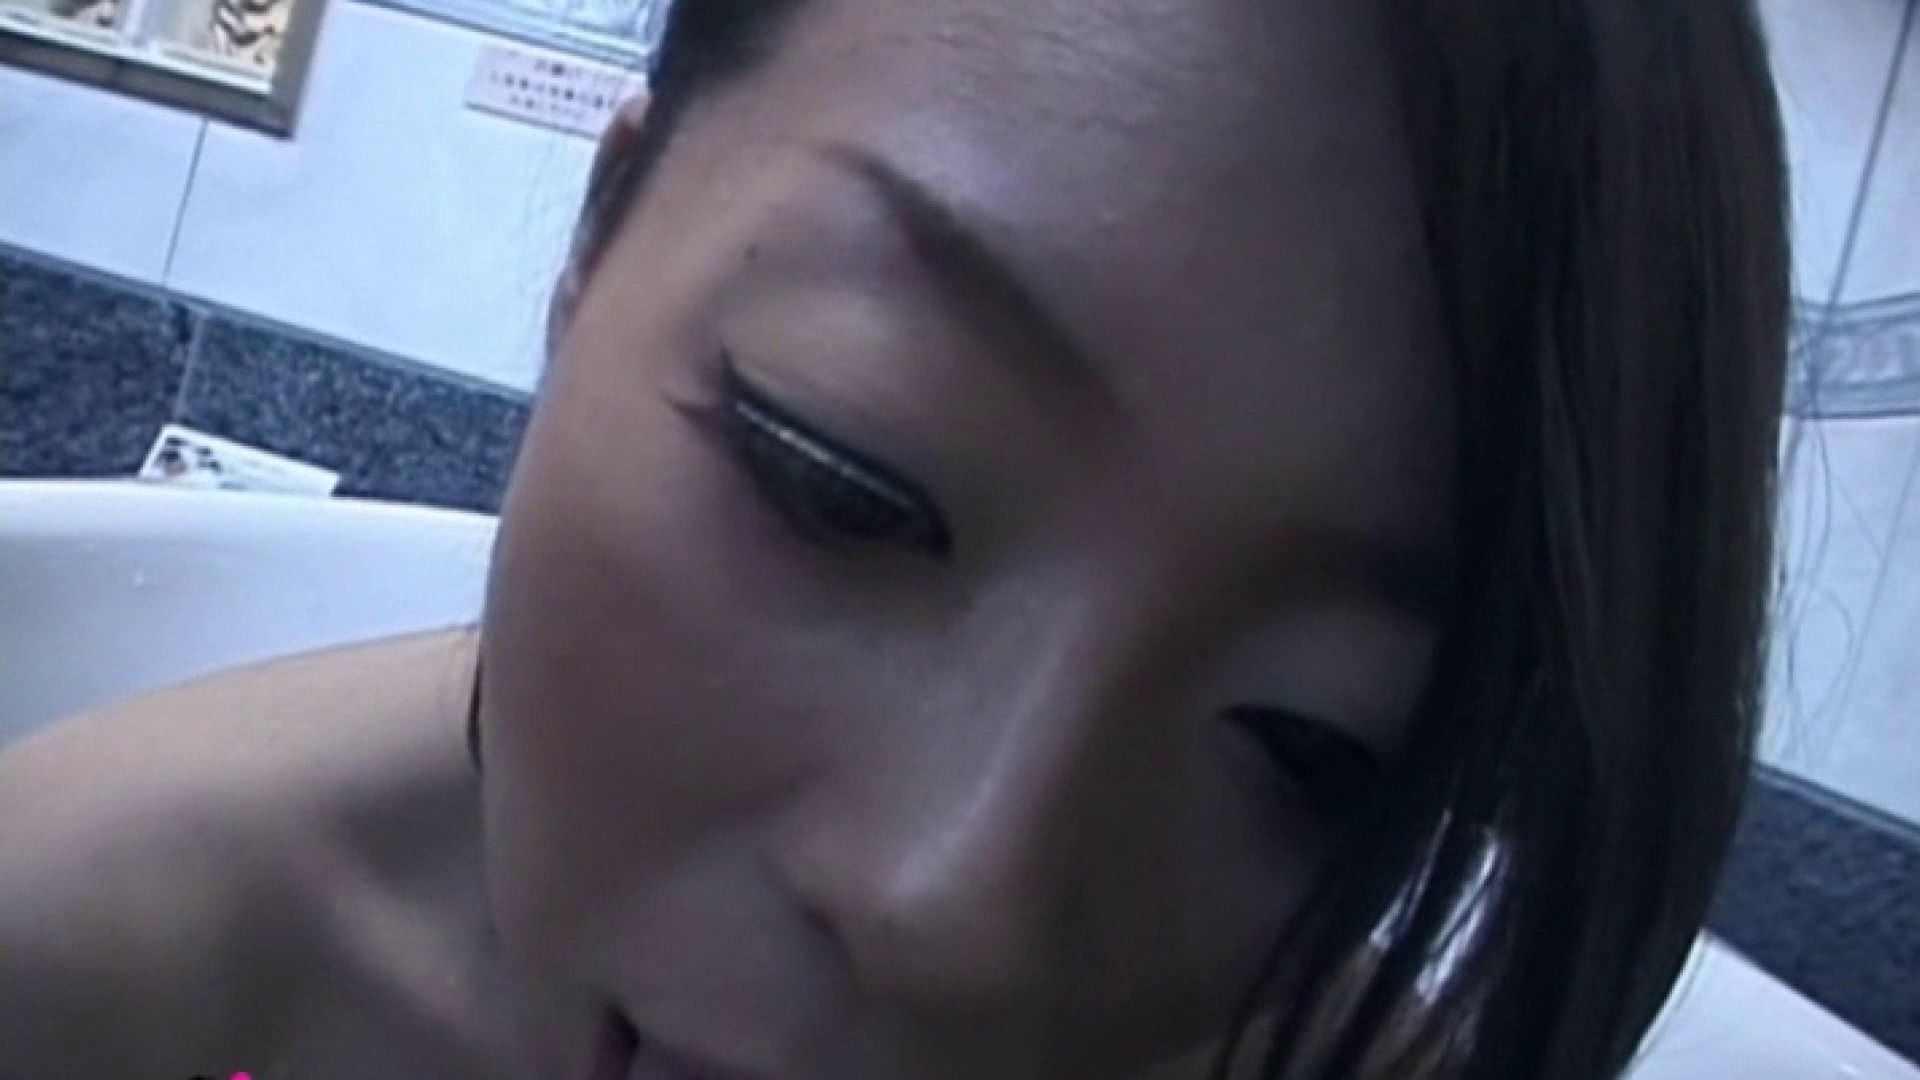 S級厳選美女ビッチガールVol.31 前編 美女丸裸 SEX無修正画像 93pic 77